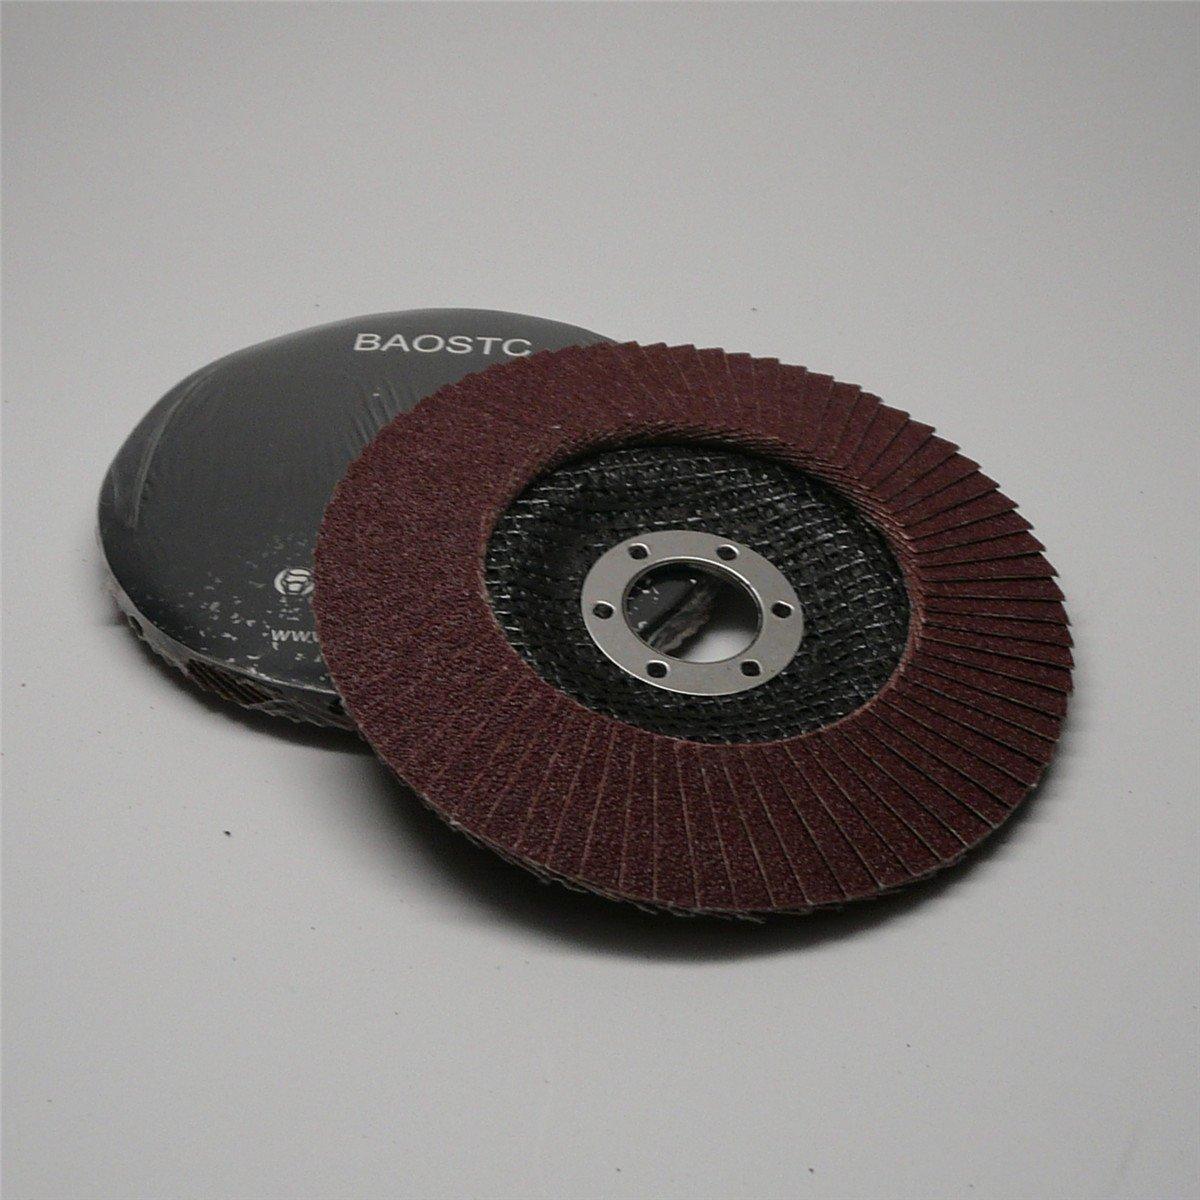 BAOSTC 5'' P120 aluminum oxide flap disc grinding wheels for angle grinder 5PACK